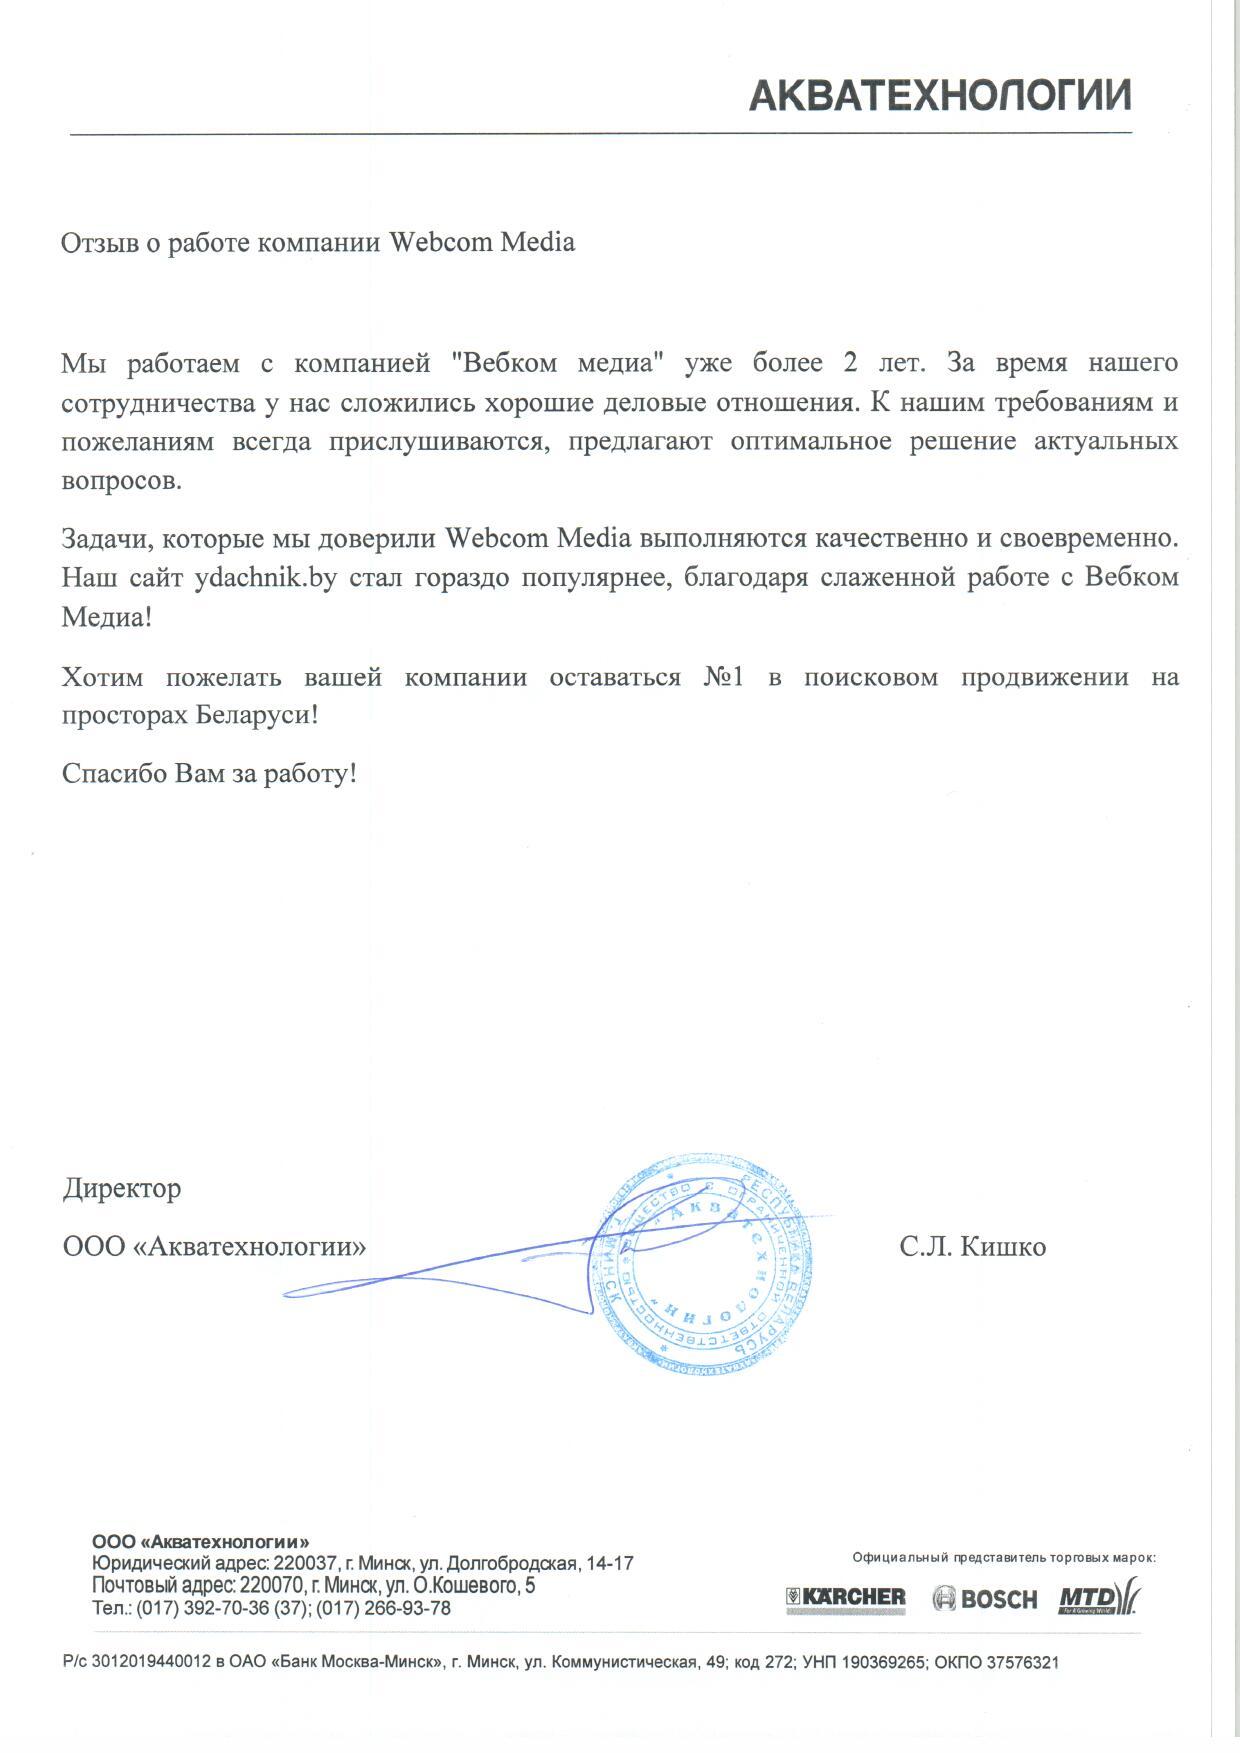 Директор ООО «Акватехнологии»